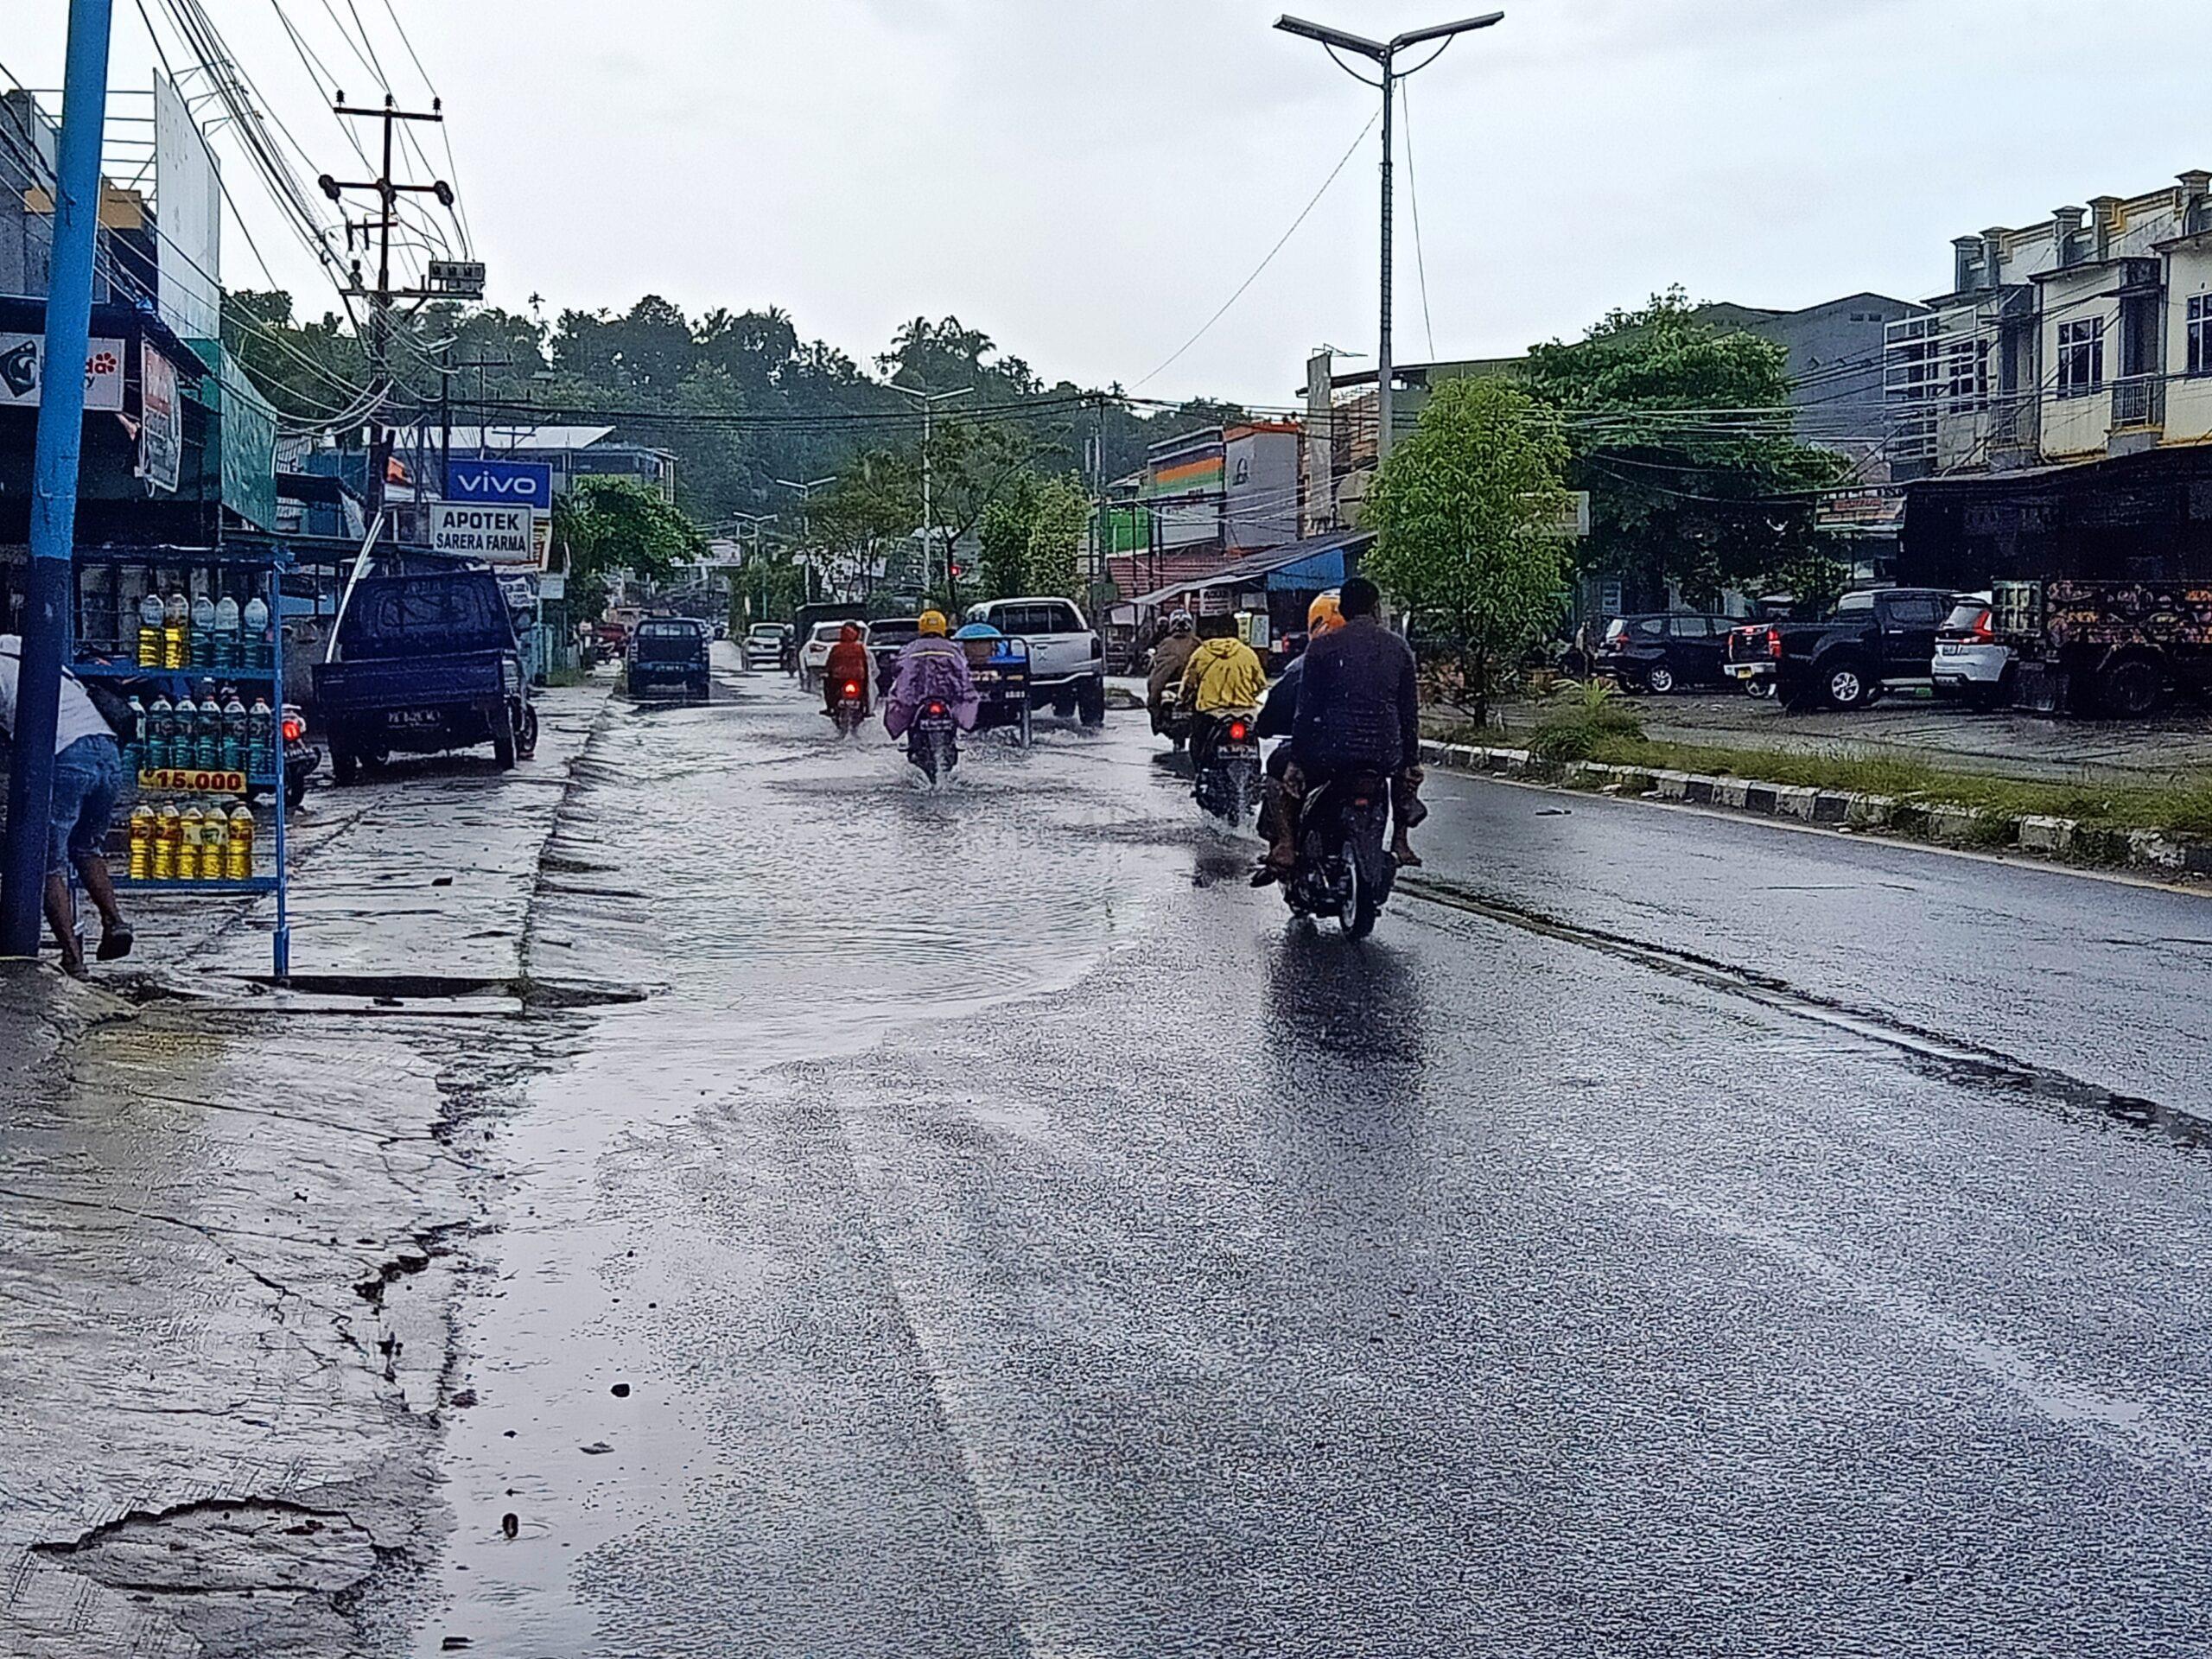 Manokwari Hujan Deras Disertai Petir dan Guntur 4 IMG 20210206 153513 scaled